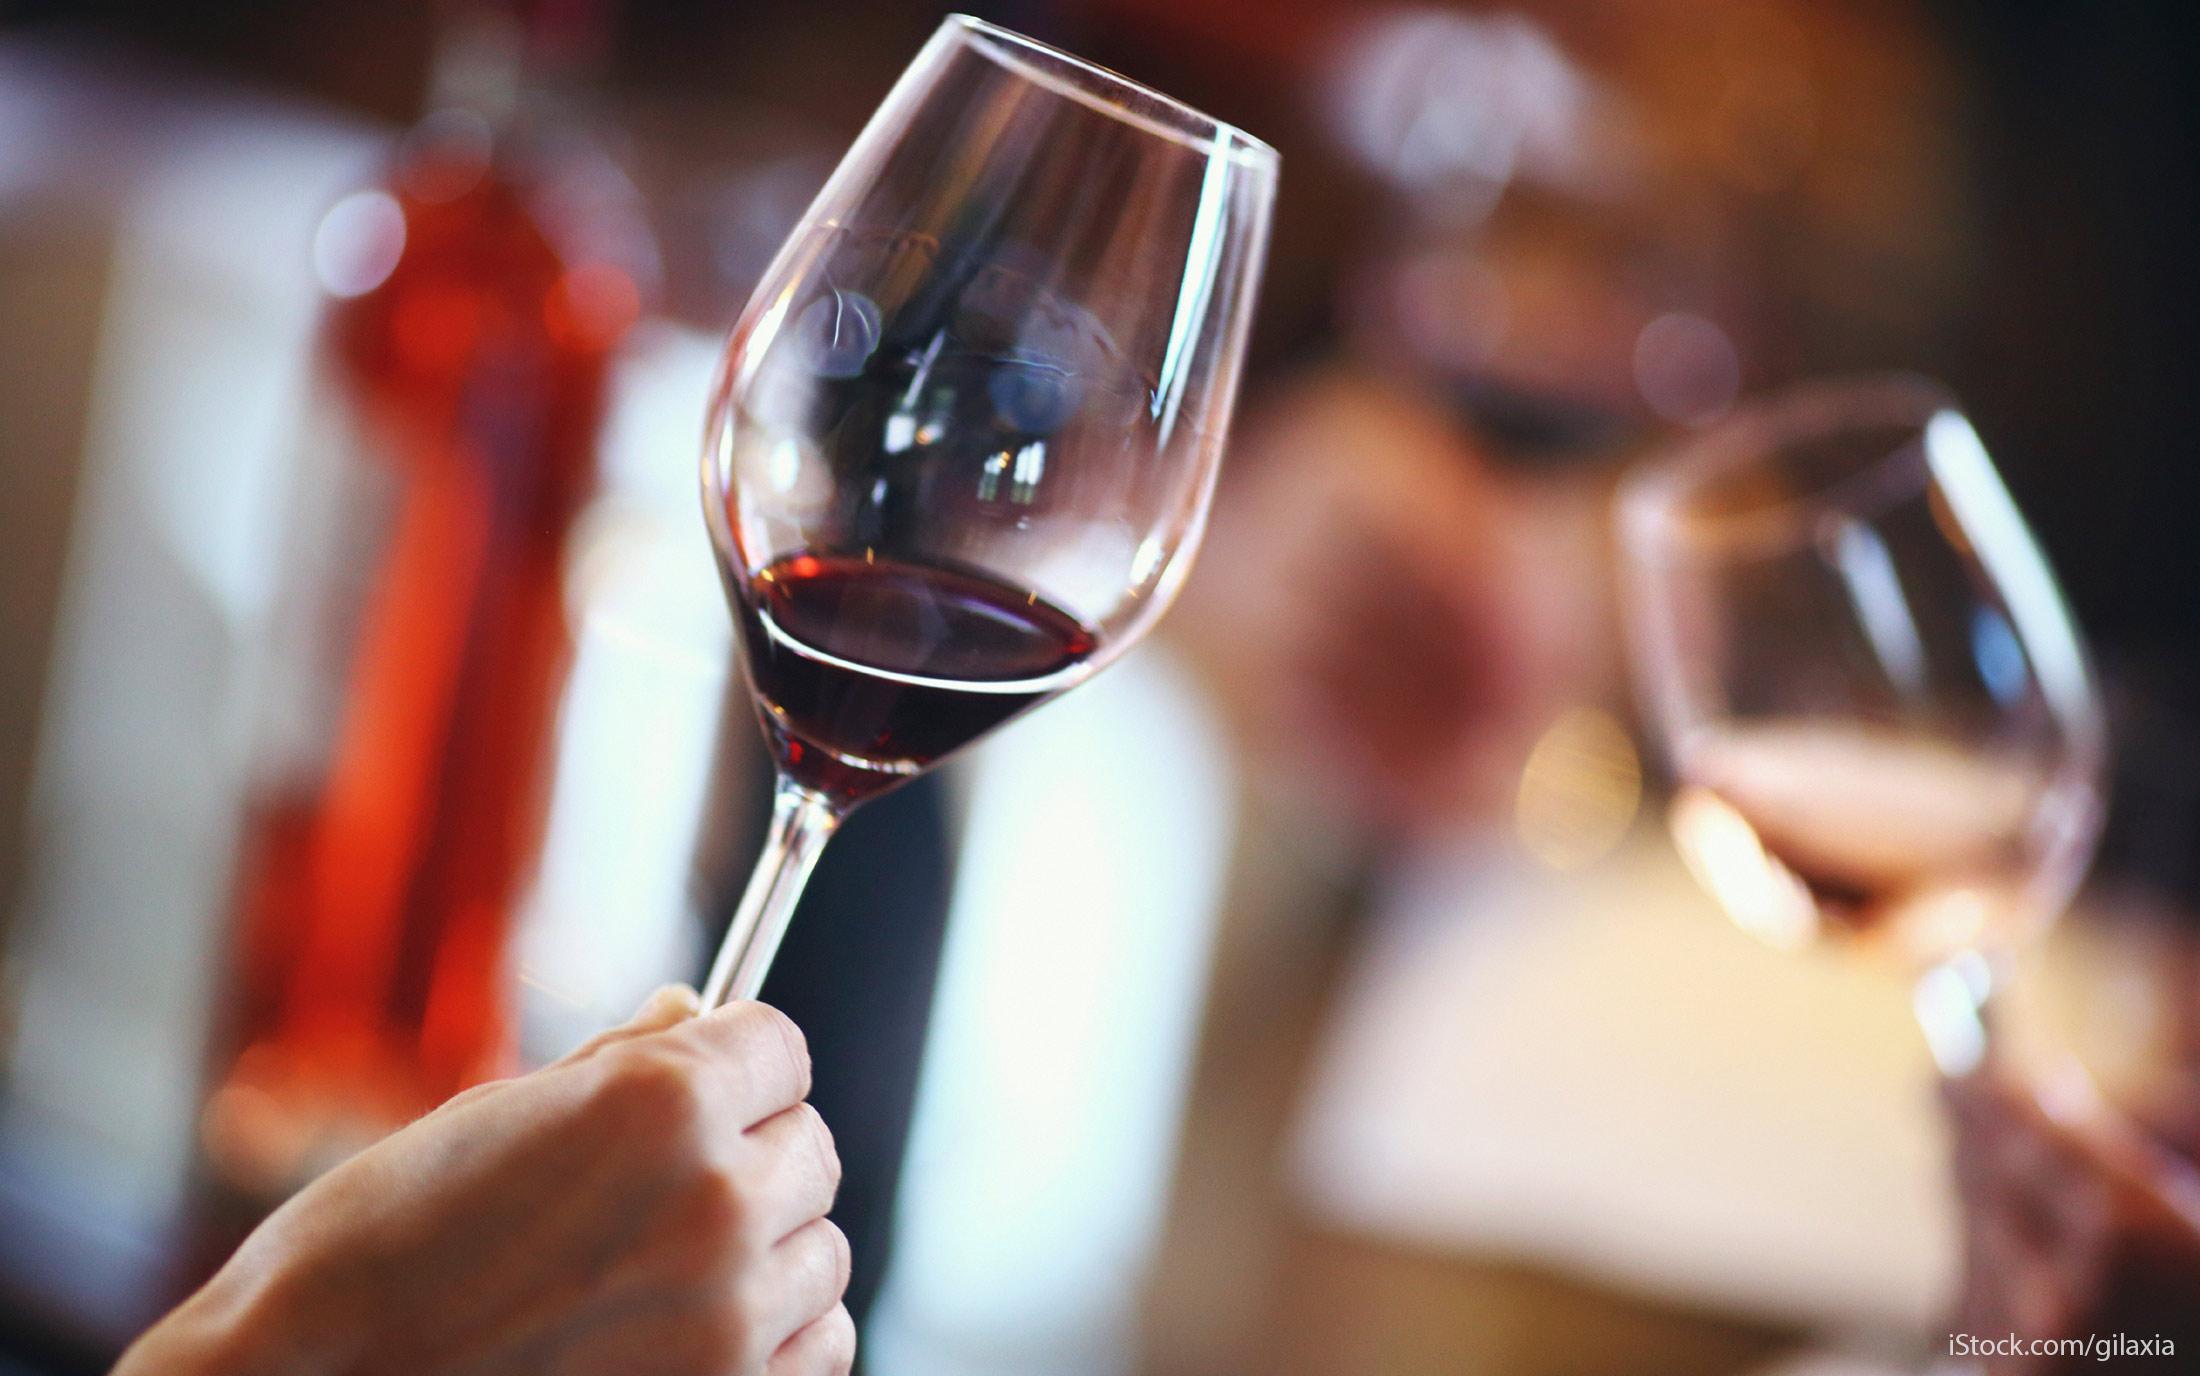 fine wine investment